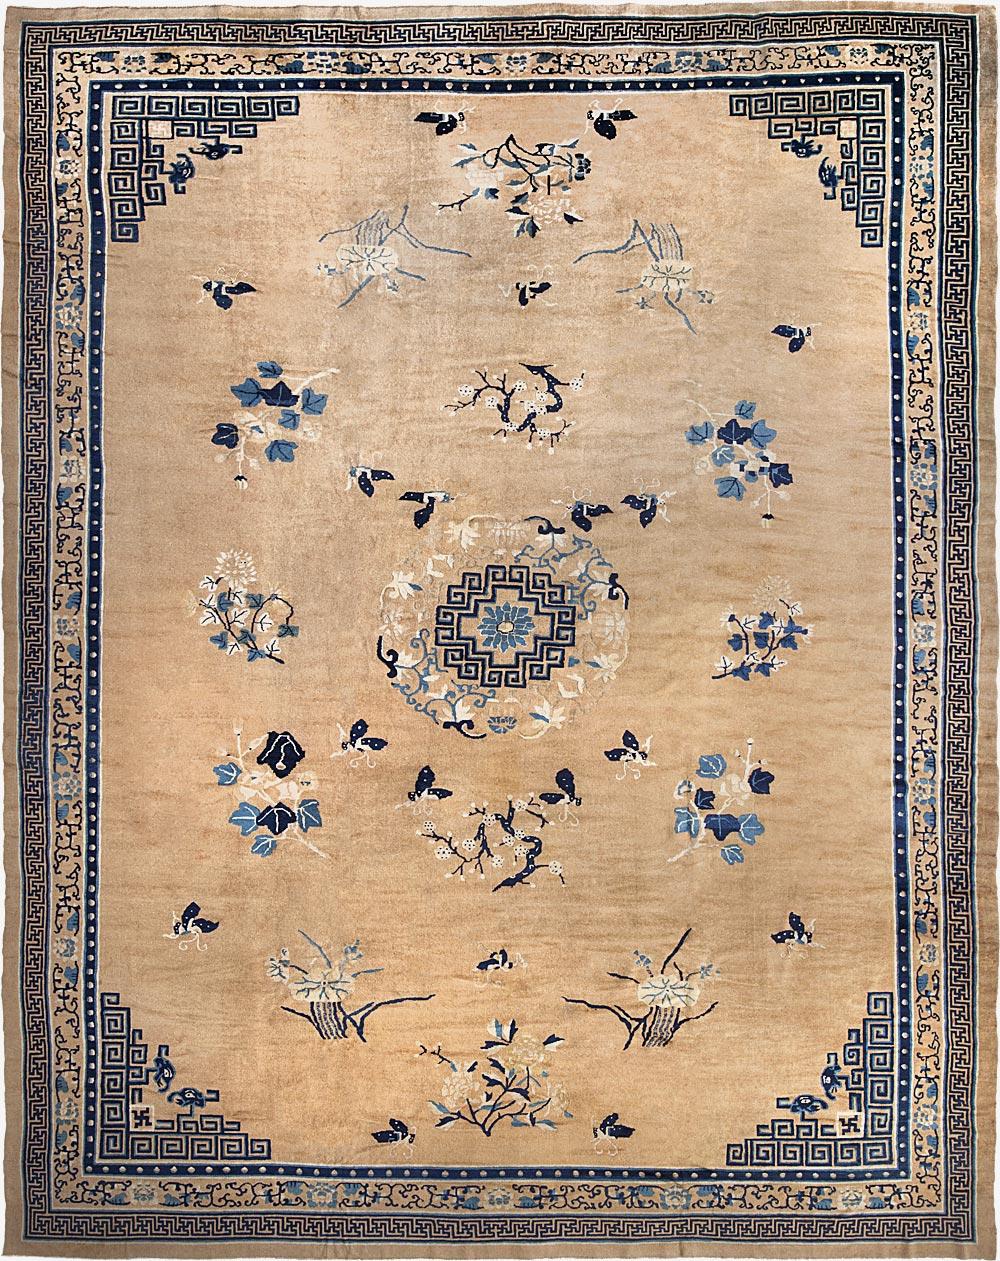 Chinese Carpet_16440